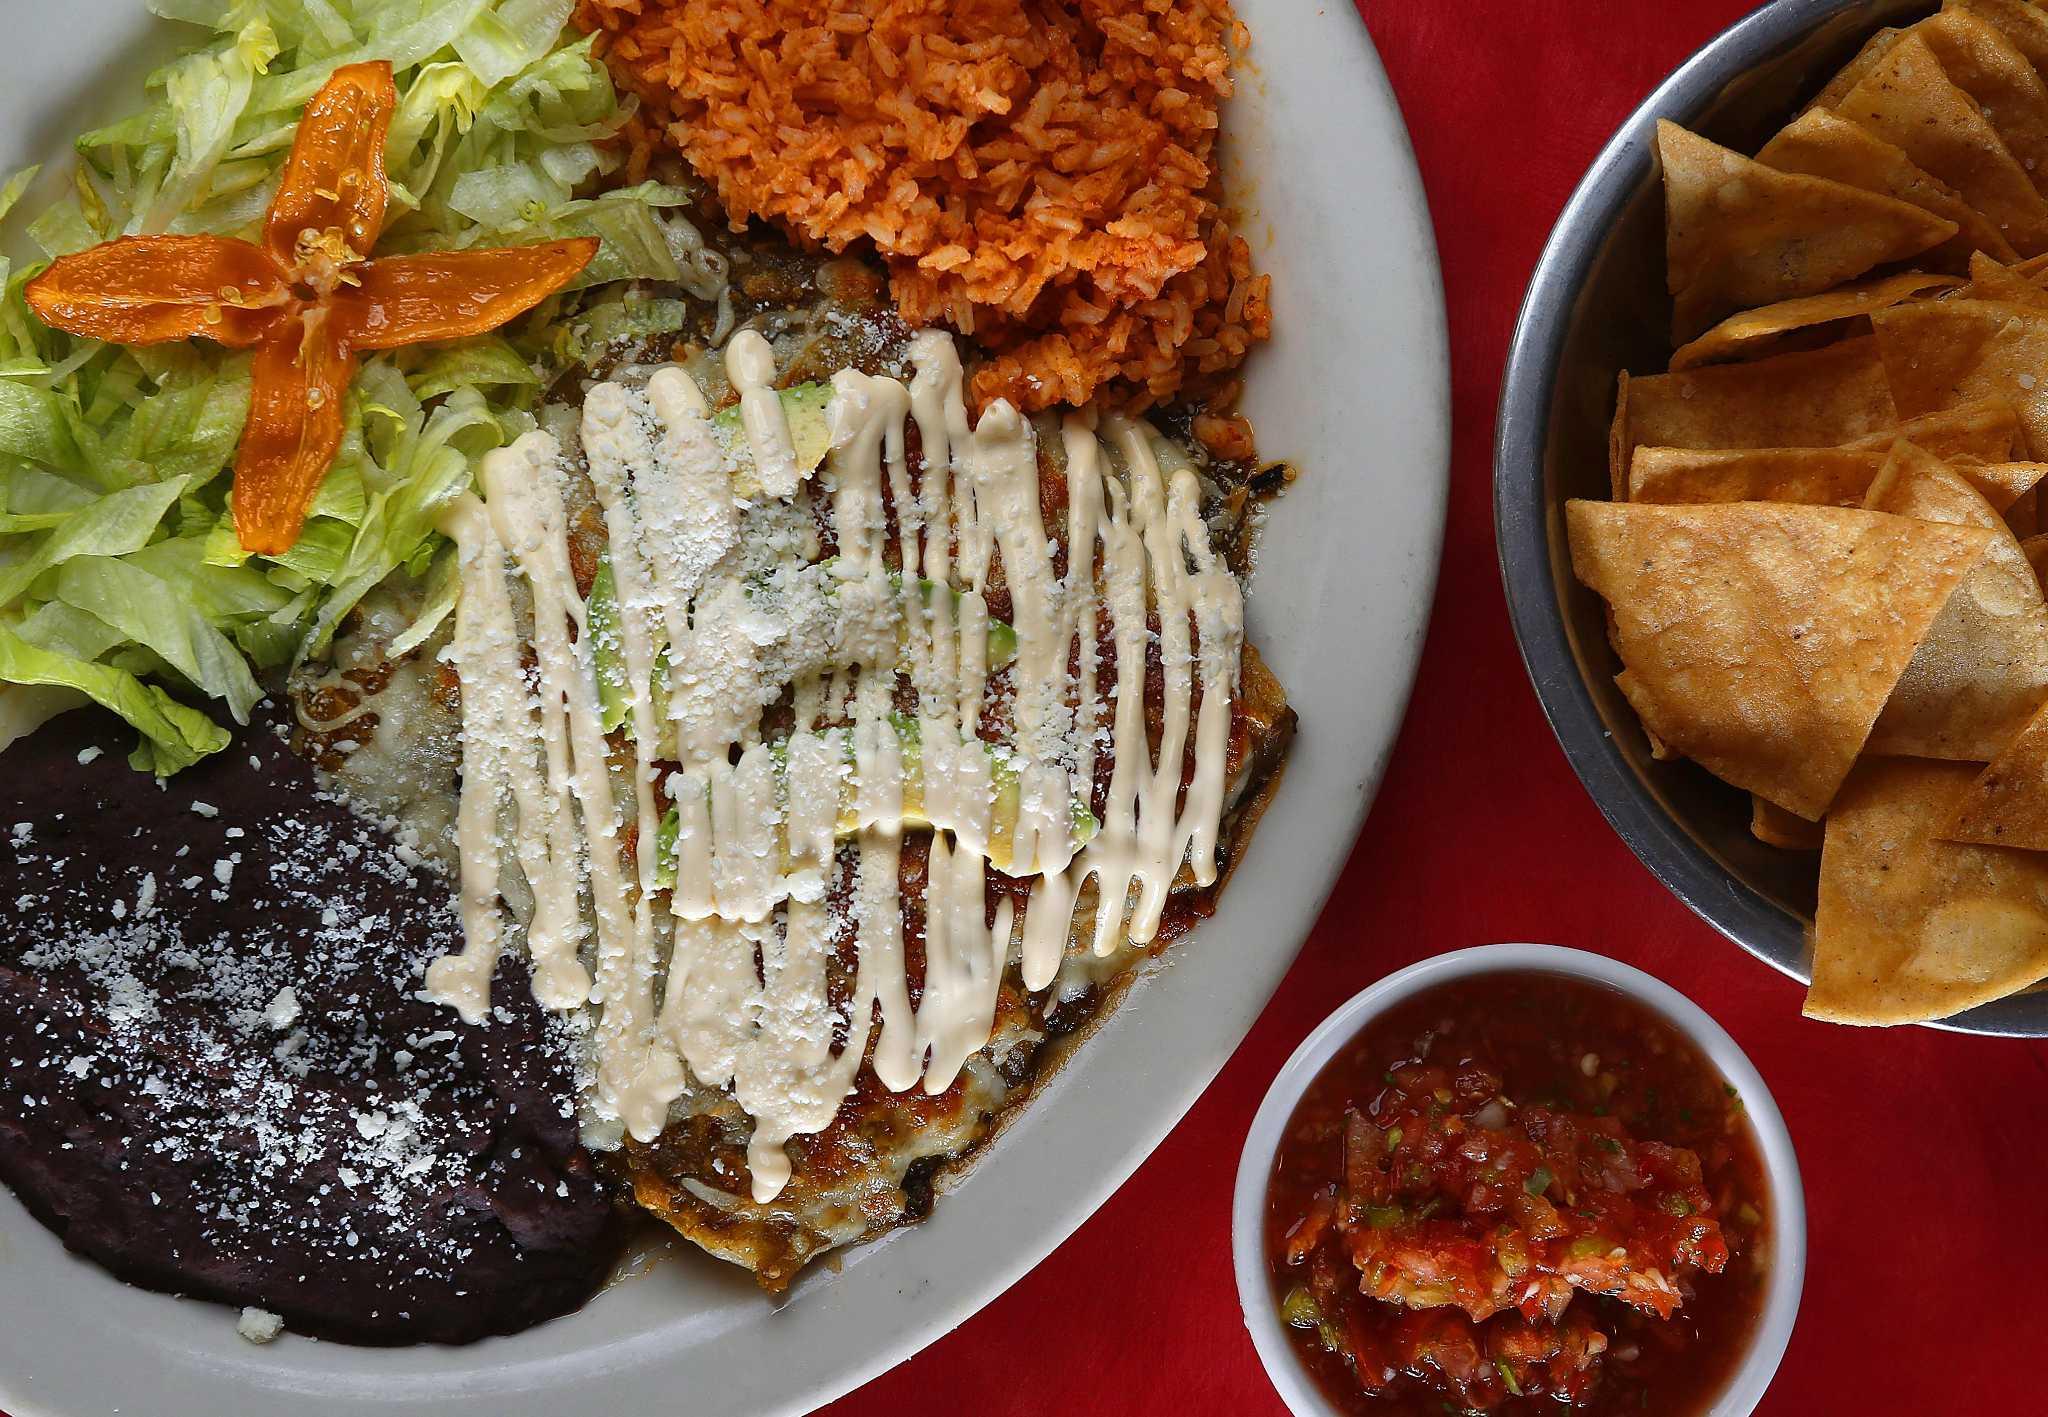 Gringo S Mexican Kitchen Announces New Katy Location